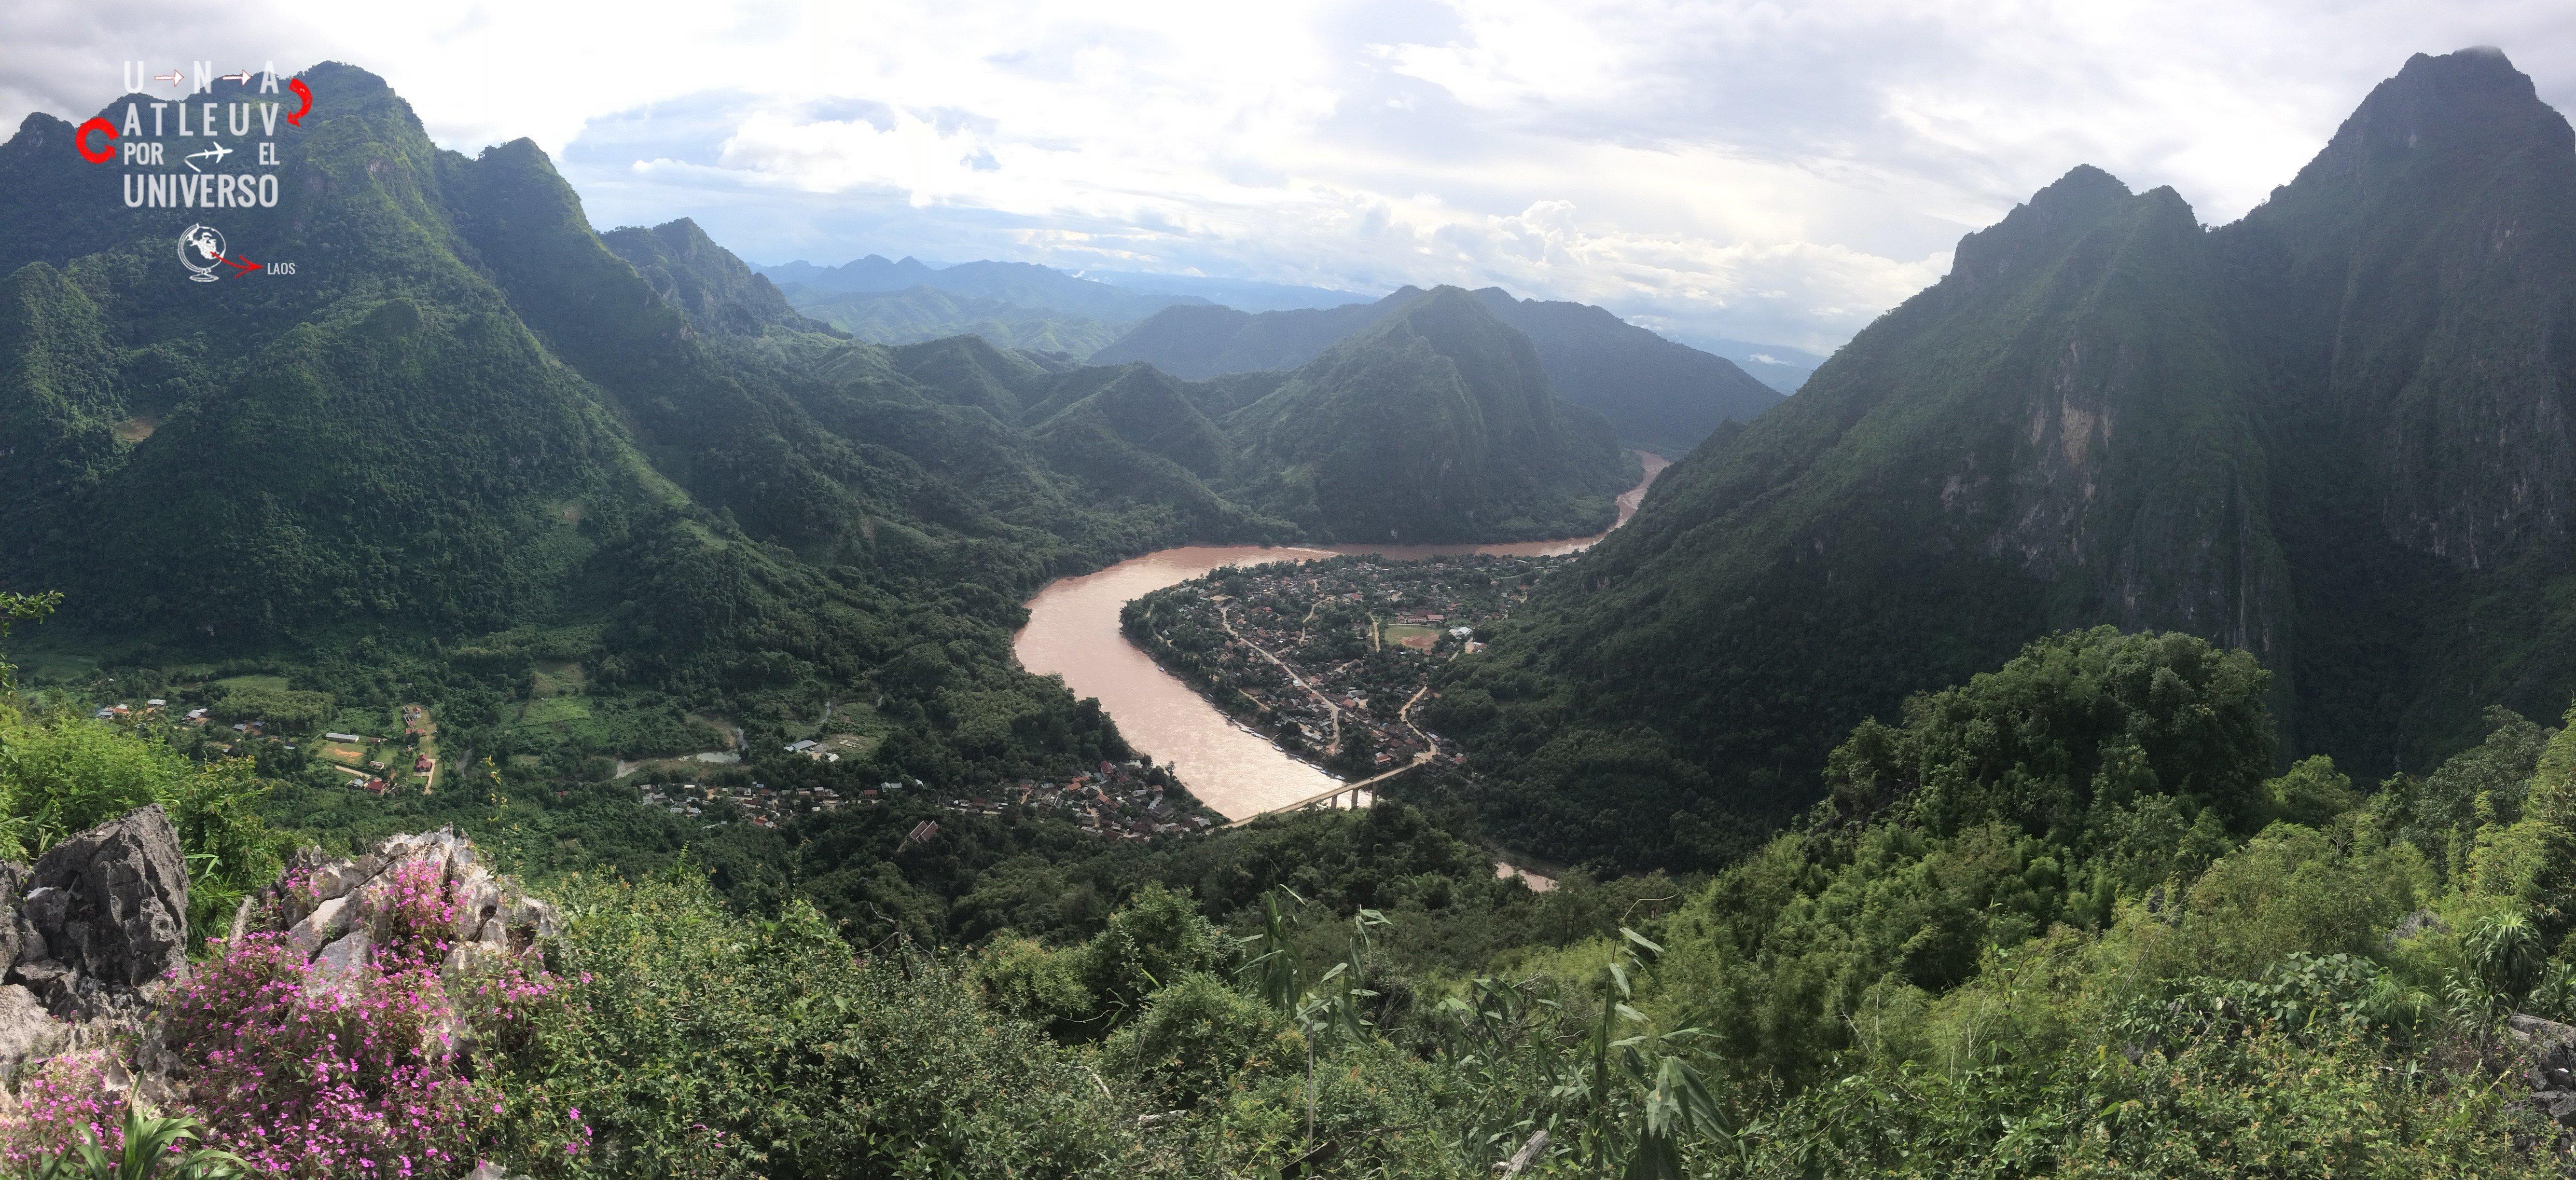 Nong Khiaw tiene paisajes así